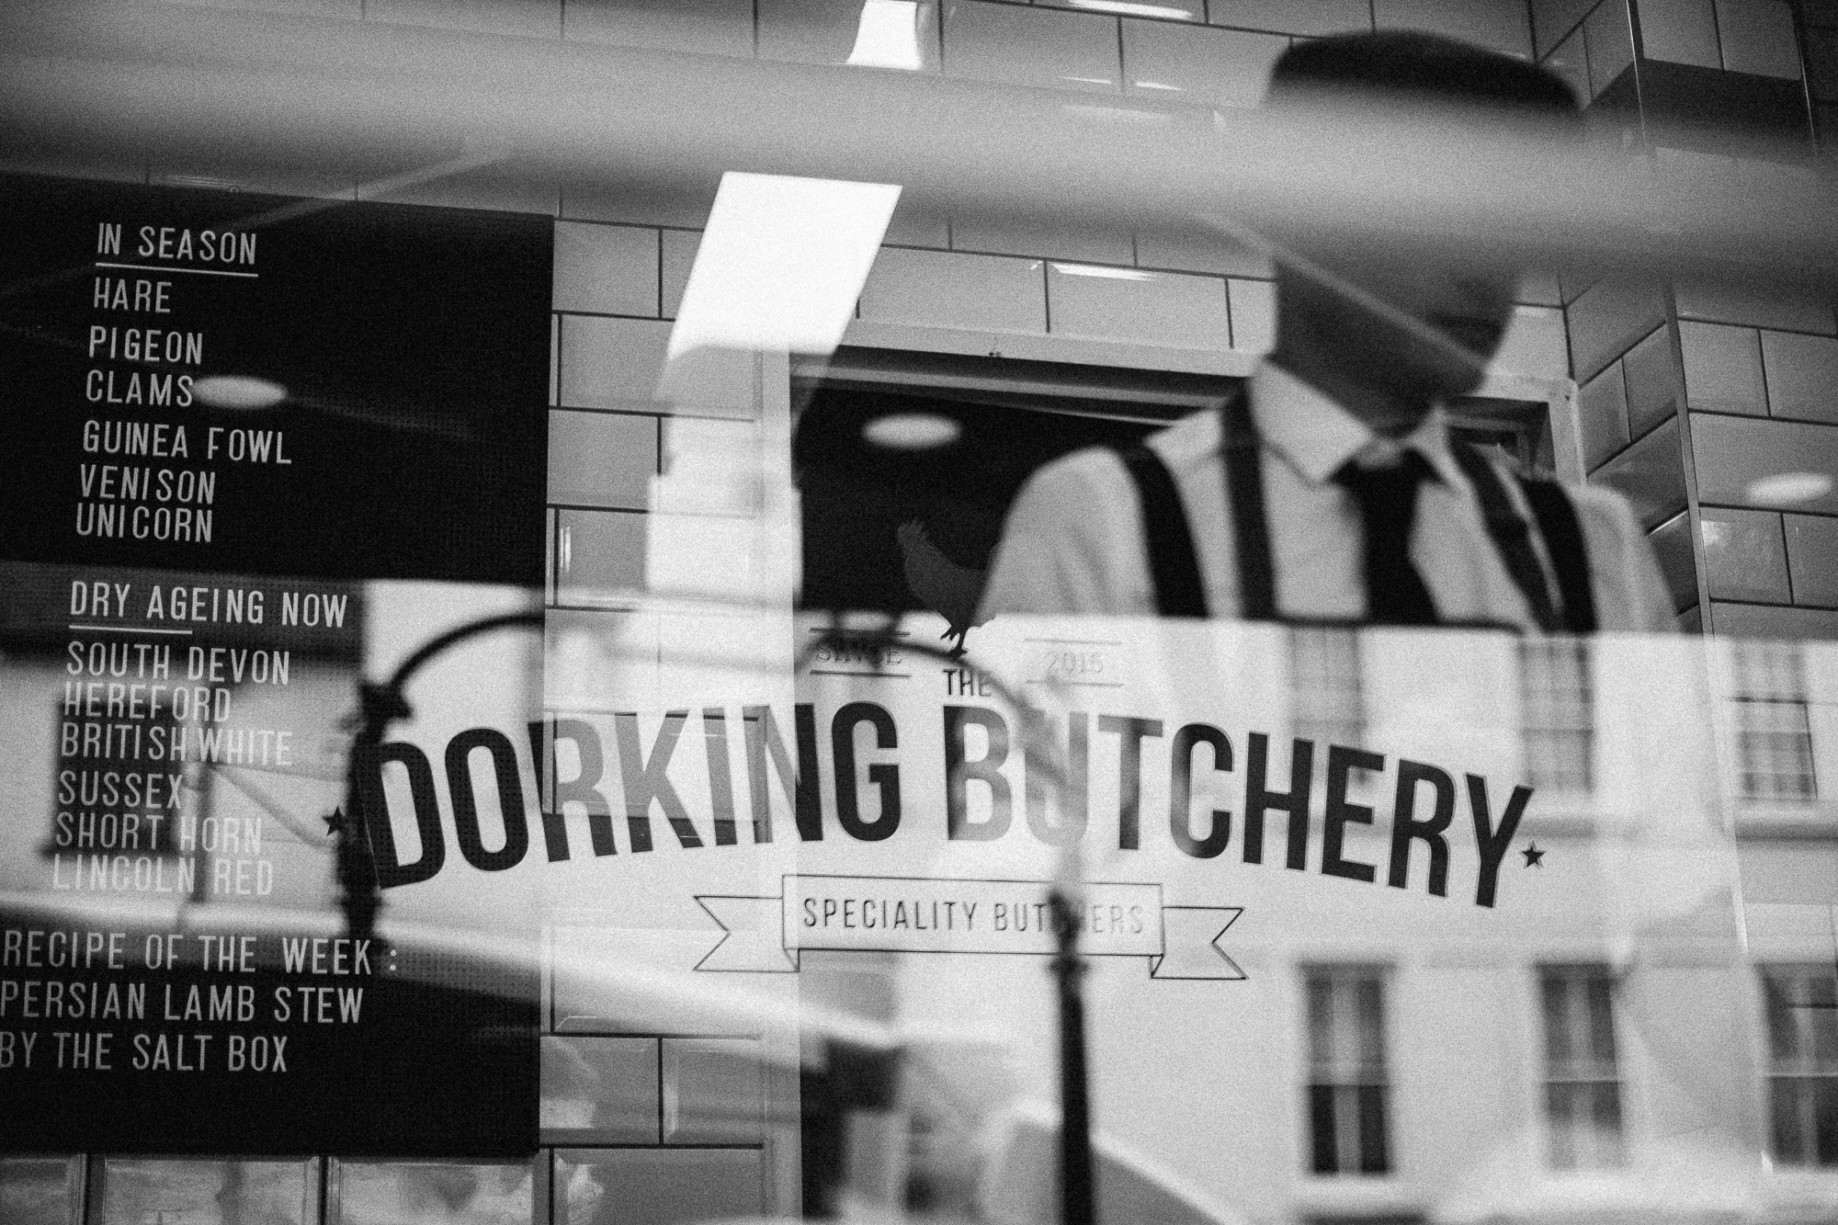 simonweller-dorking butchery-1